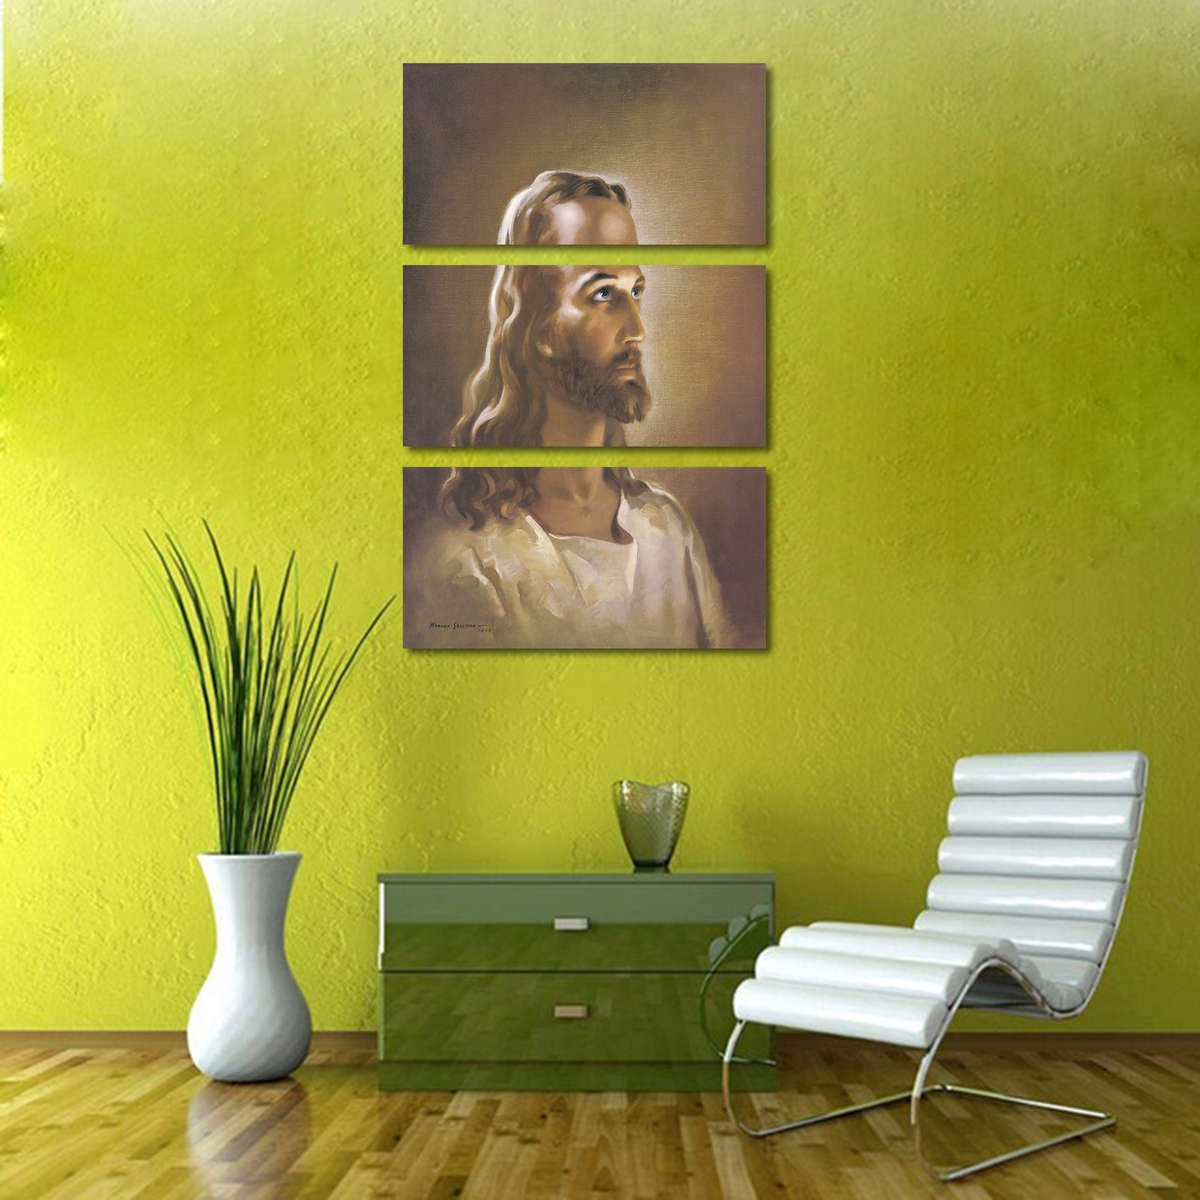 Outstanding Christian Picture Frames Wall Decor Frieze - Wall Art ...